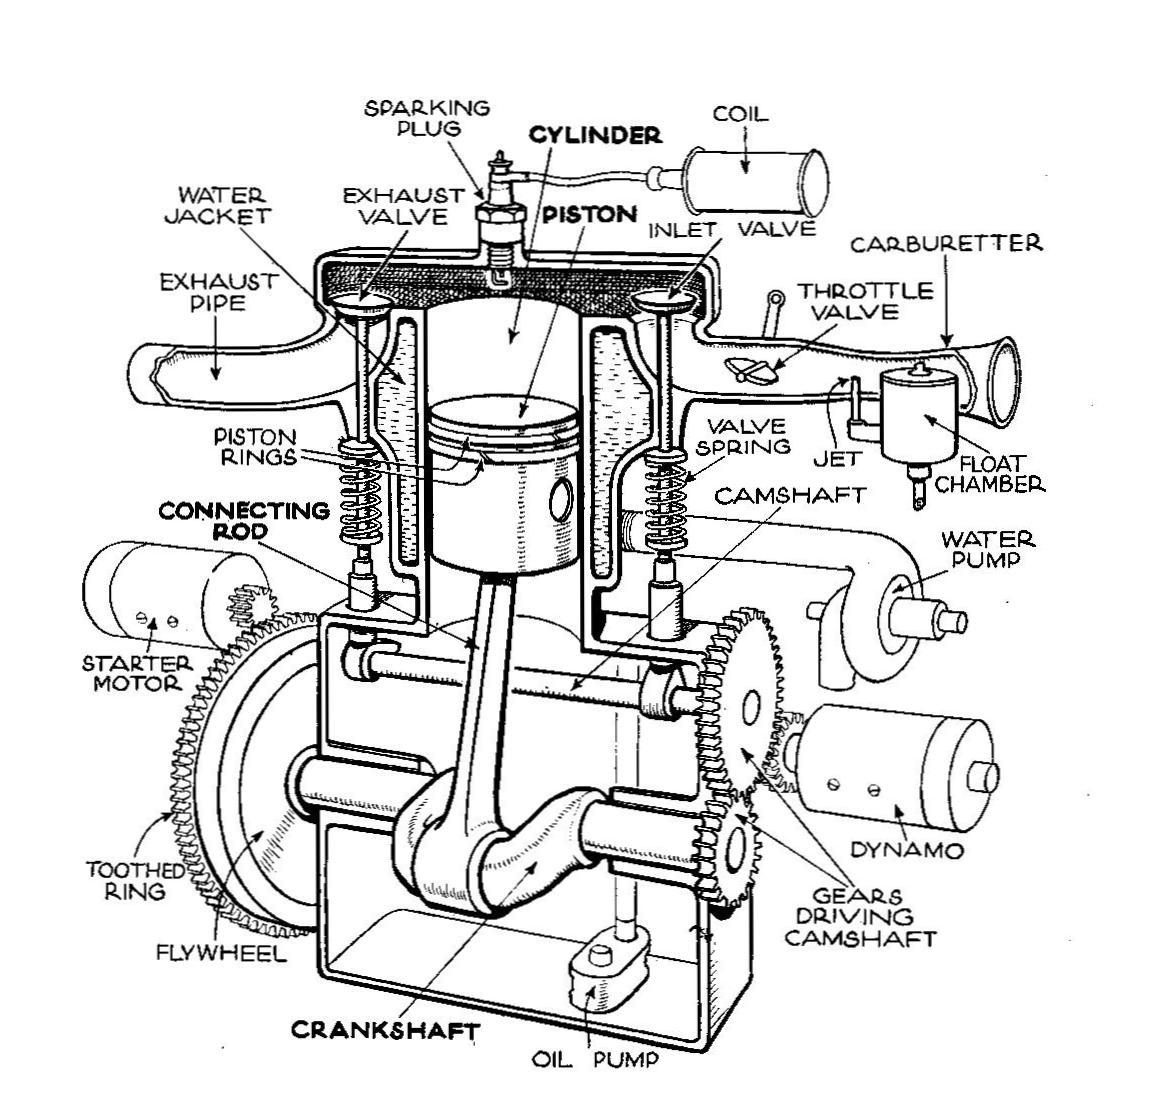 Basicautomobile Engine Lubrication System